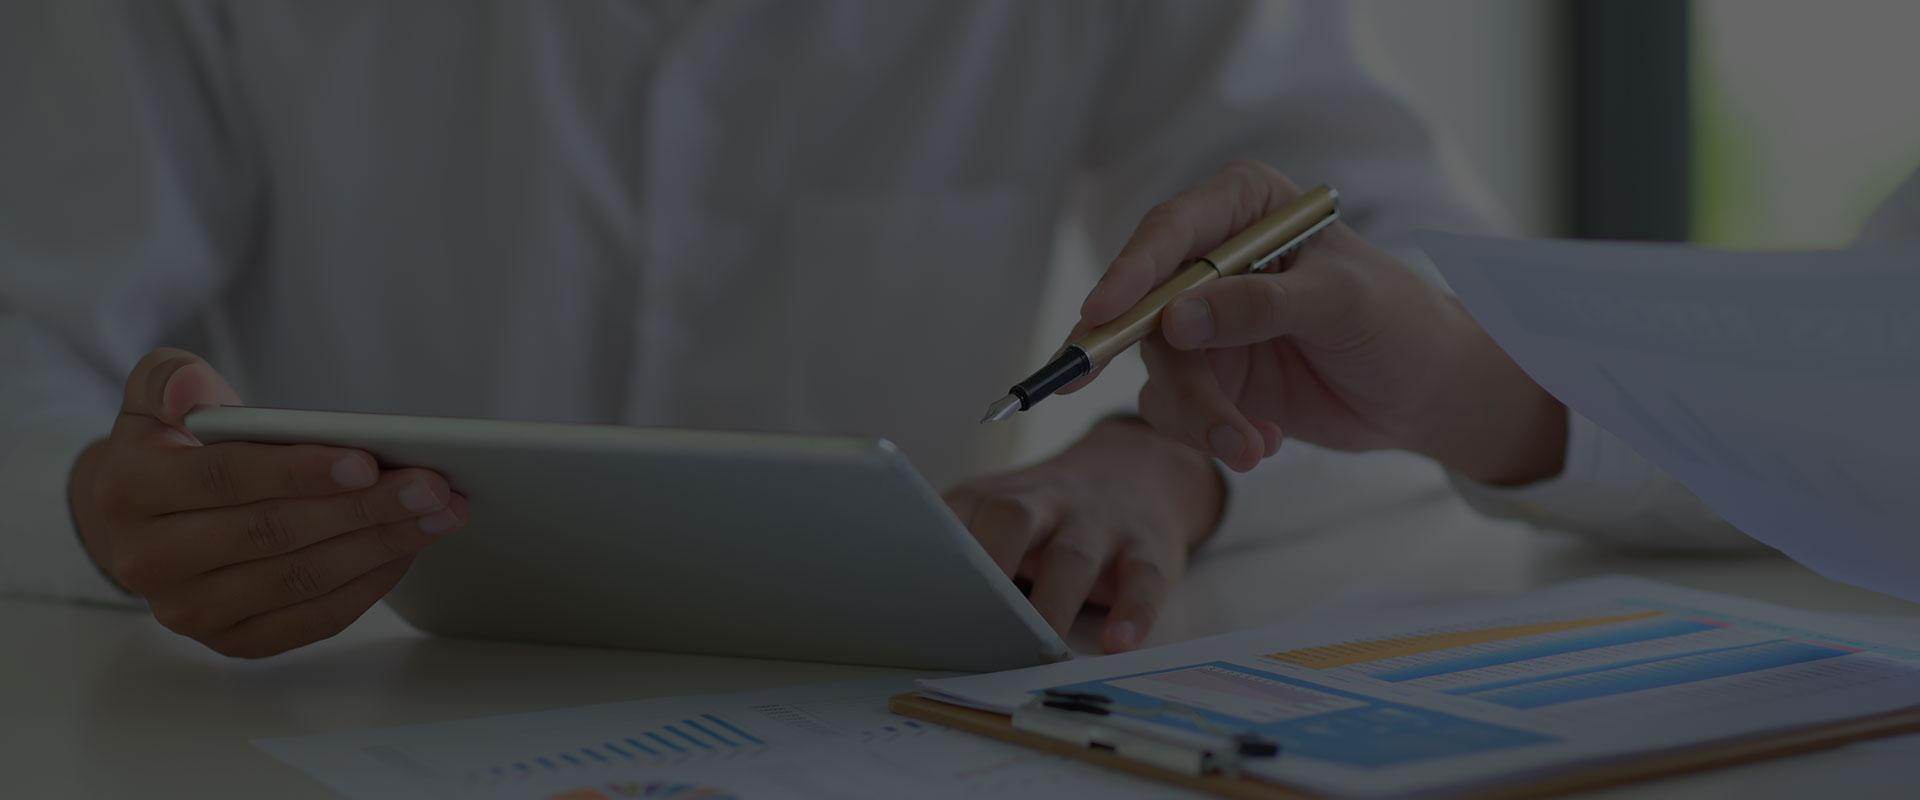 Surveyor Competency Assessment Assets55